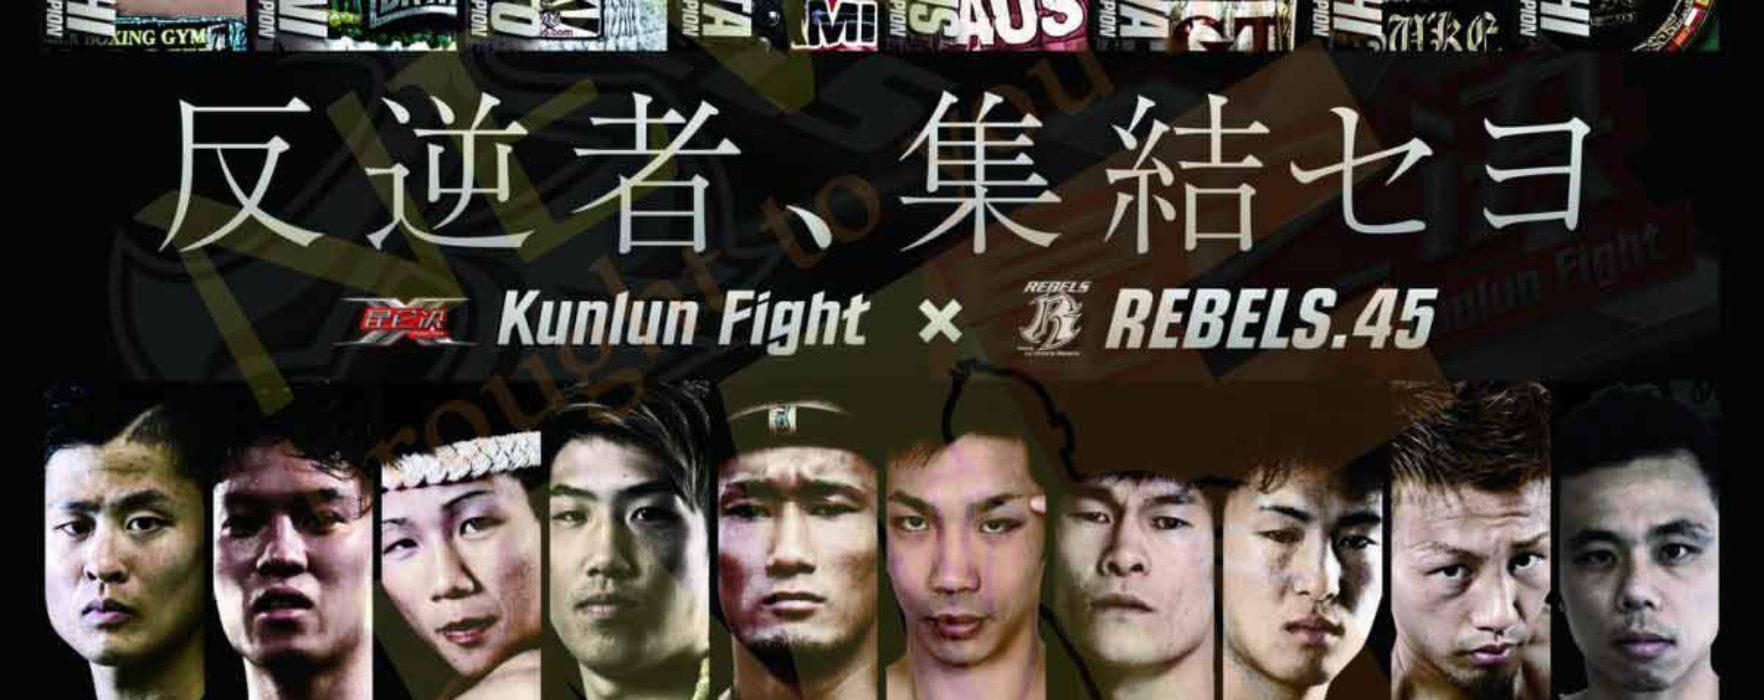 Card: Kunlun Fight 49 / Rebels.45 ft. Albert Kraus, Petchanong, Yamato etc – Tokyo – 7th August 2016